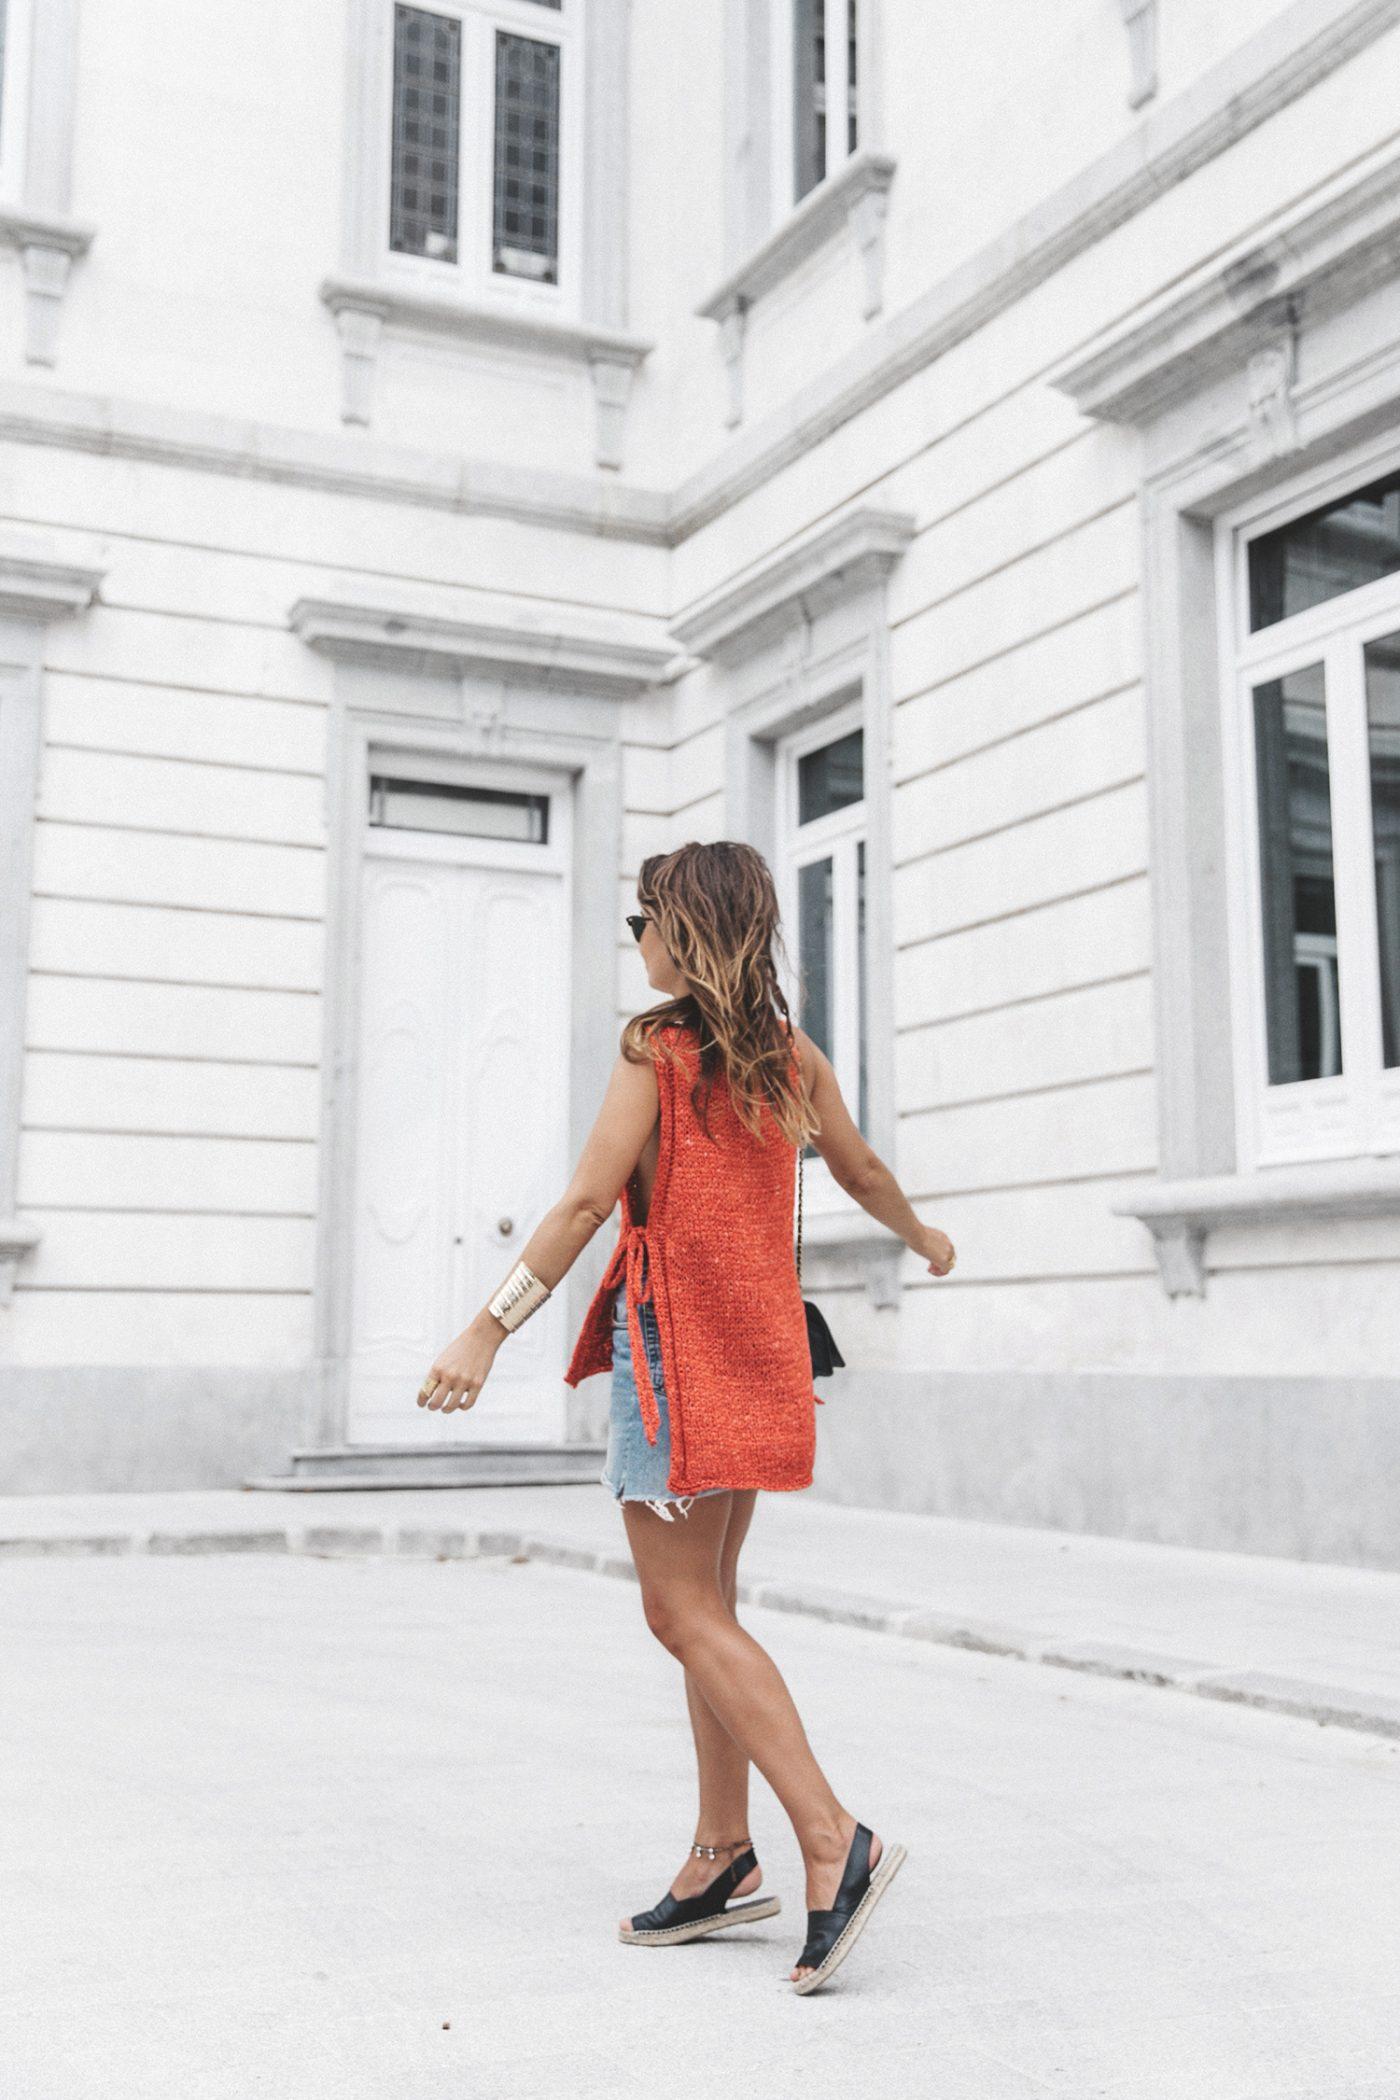 Summery_knit-Levis_Vintage_Skirt-Zalando_Espadrilles-Black_Sandals-Collage_Vintage_Horn_Necklace-Outfit-Street_Style-36